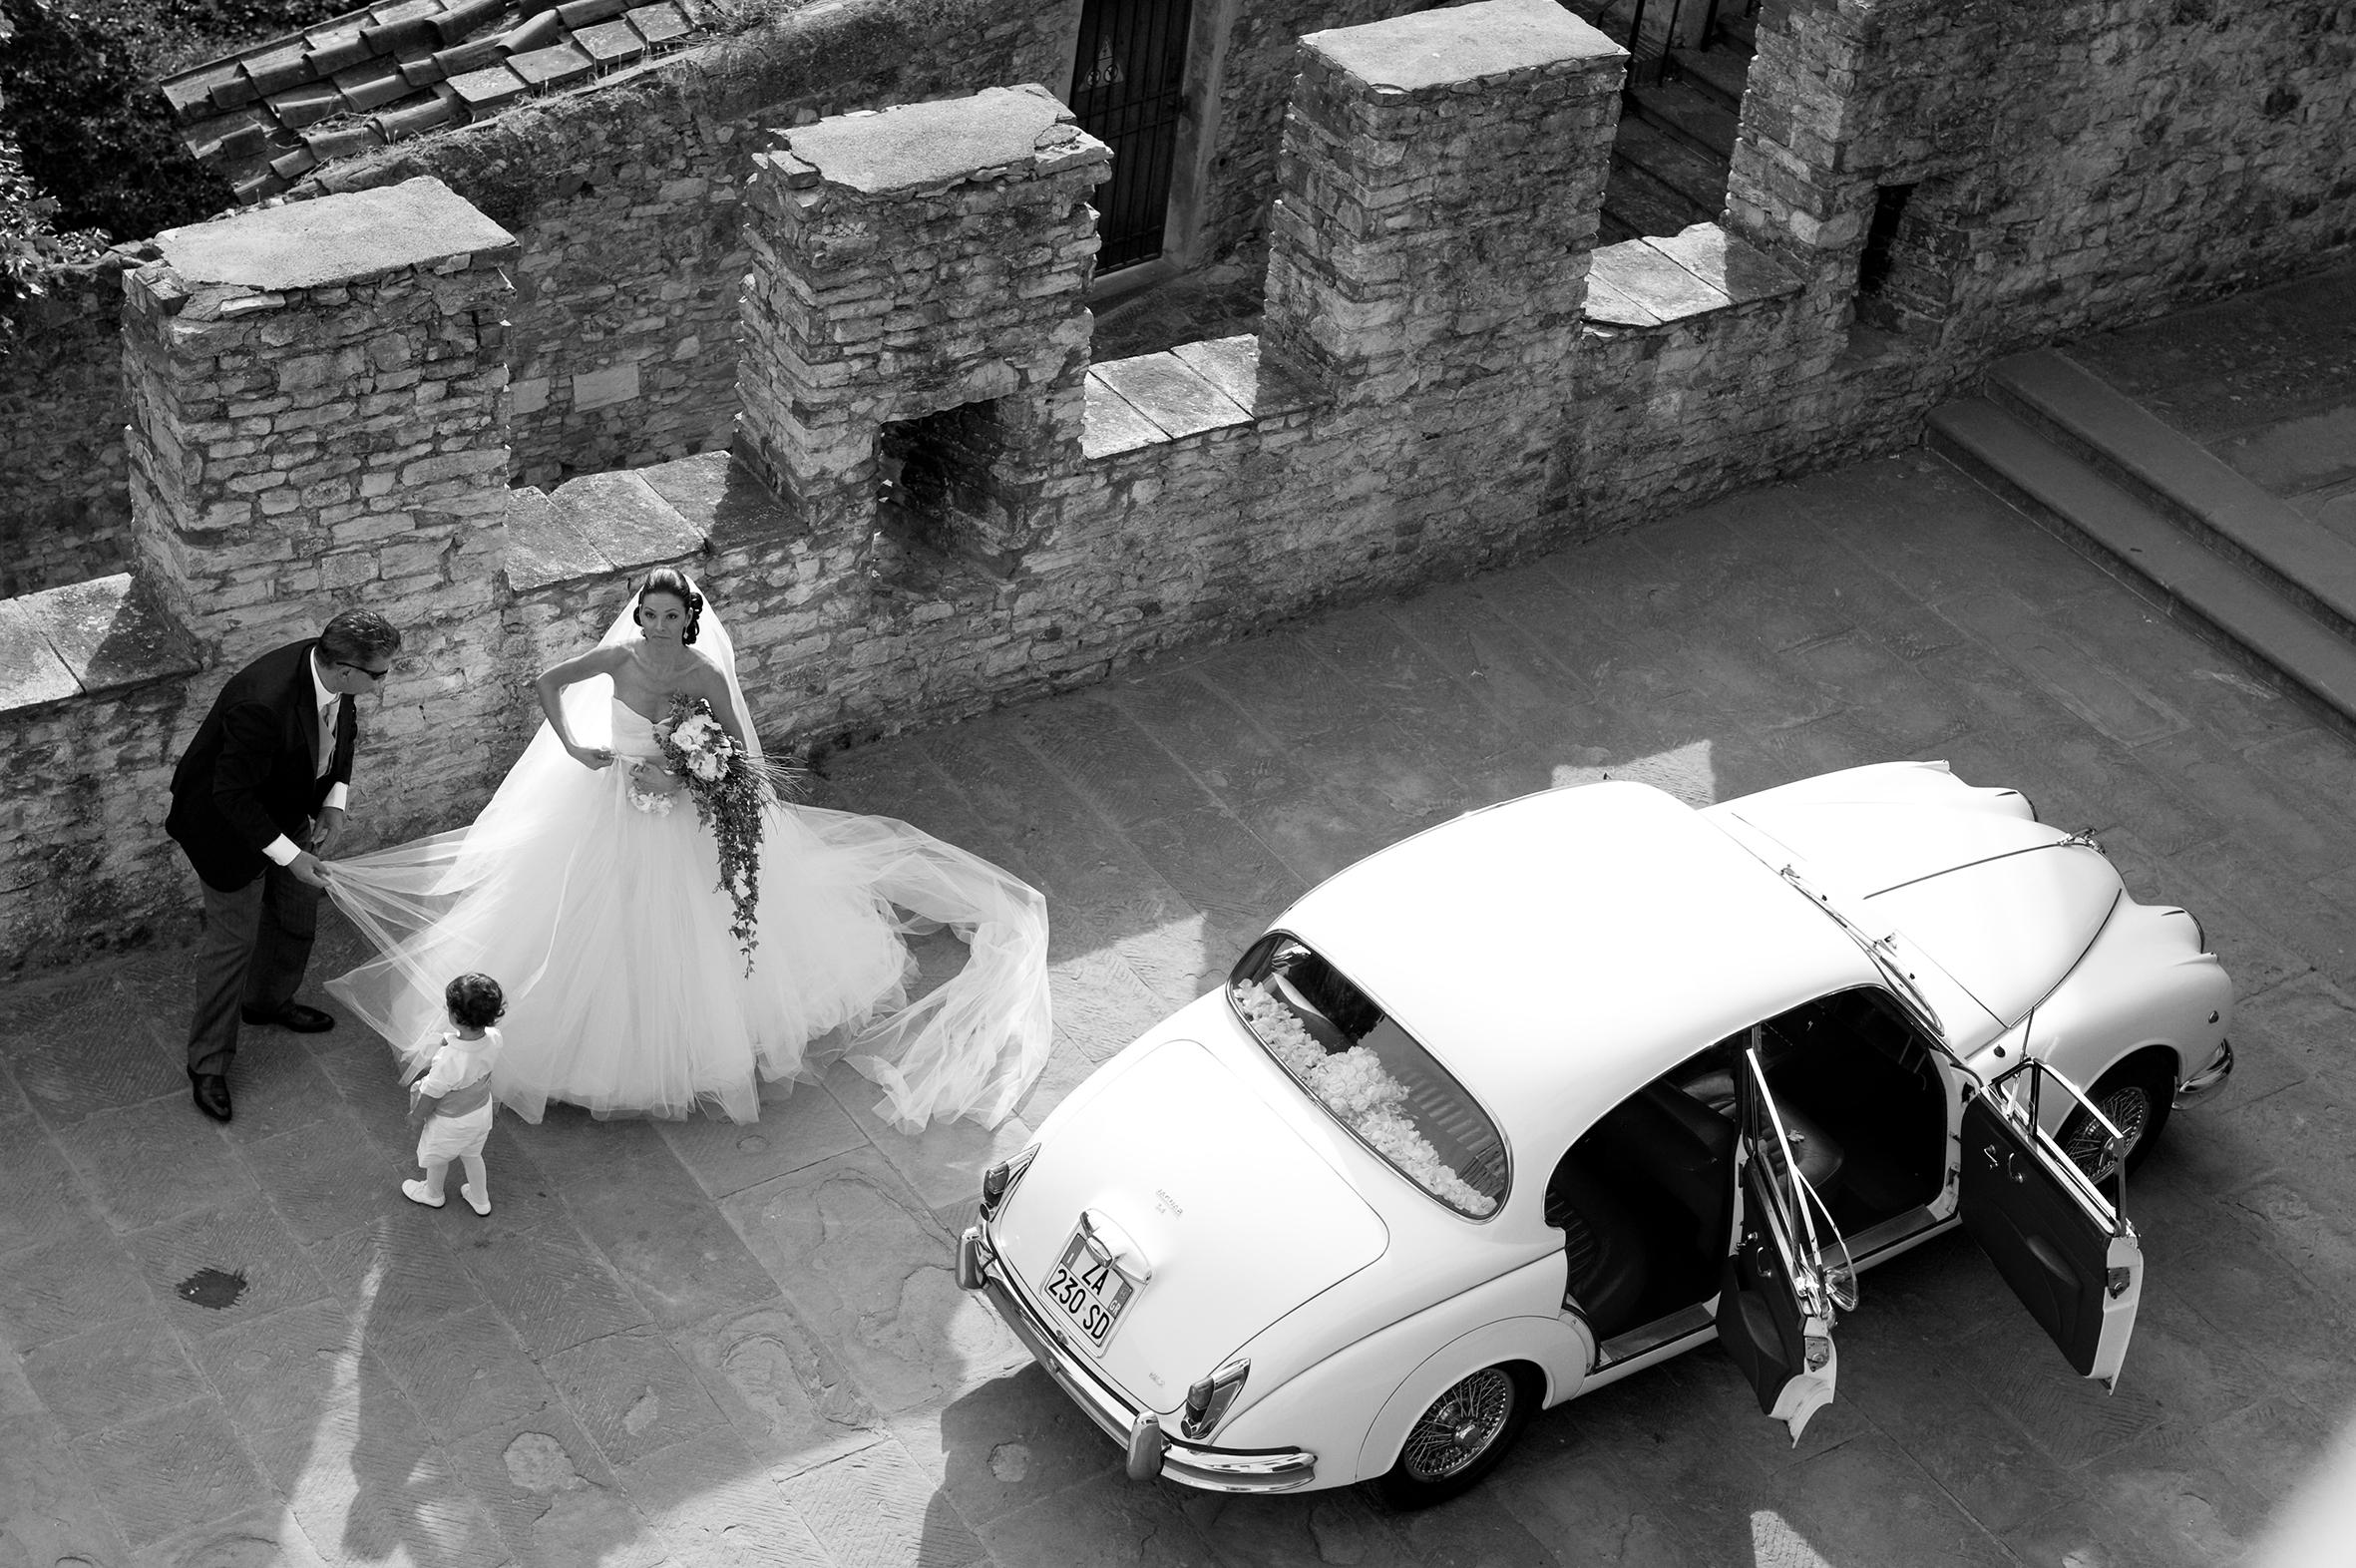 Foto_Bettina_Conradi_Hochzeit22.jpg